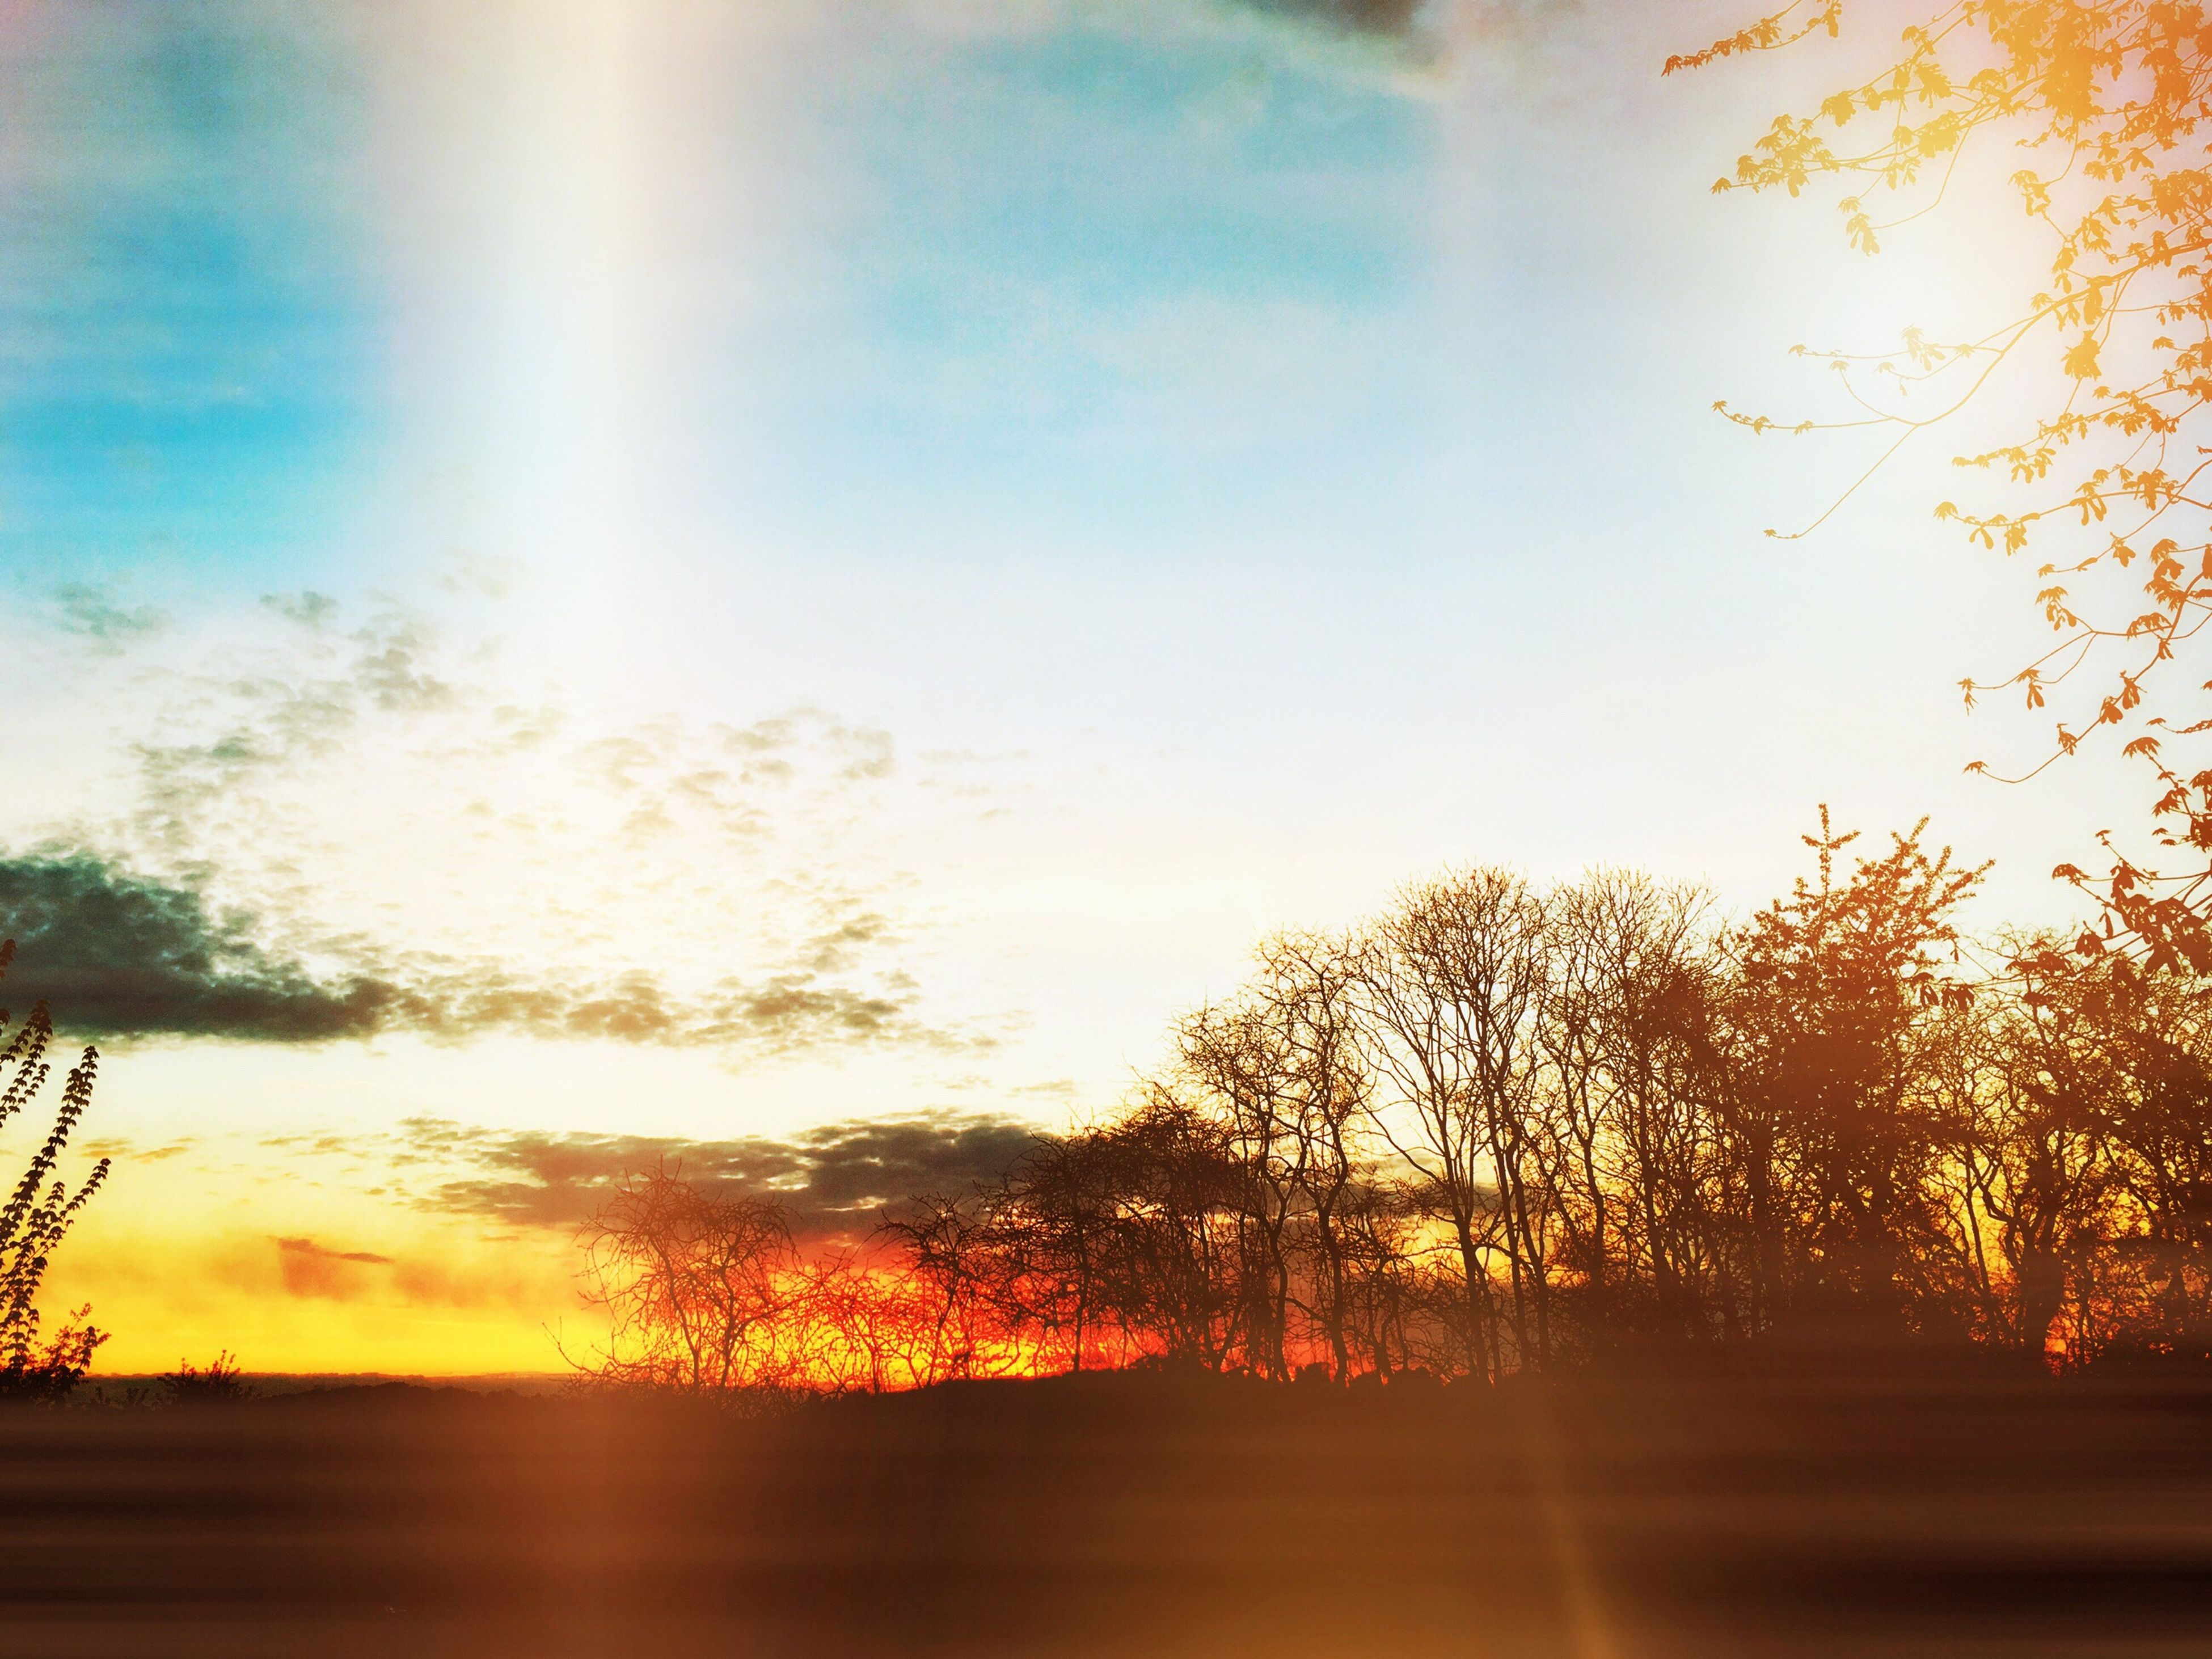 sunset, sun, tree, tranquil scene, tranquility, scenics, sky, beauty in nature, silhouette, nature, orange color, idyllic, sunlight, sunbeam, cloud - sky, lens flare, growth, landscape, cloud, back lit